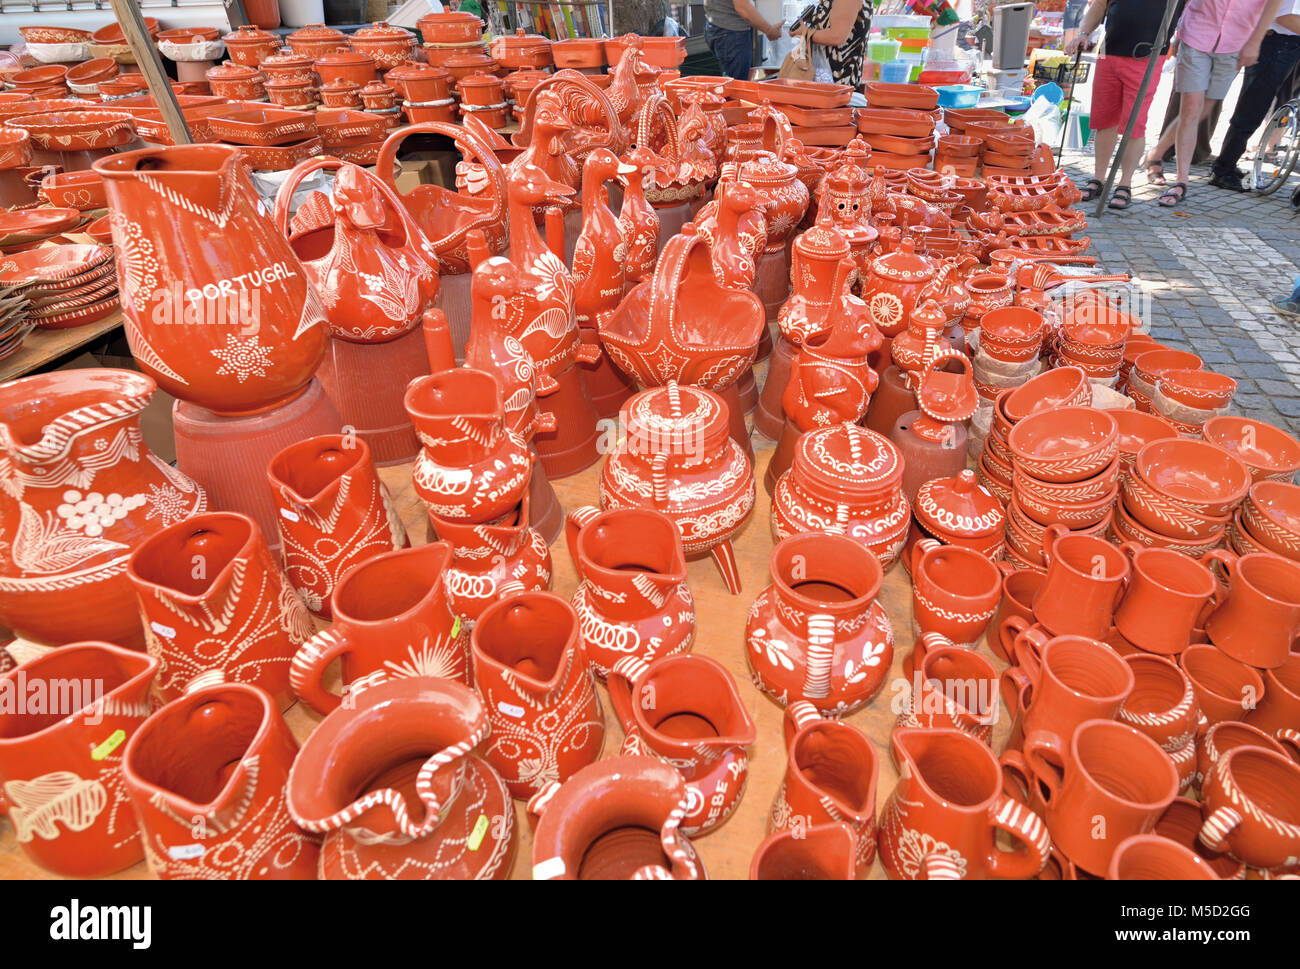 Terracotta ceramics on market stand - Stock Image